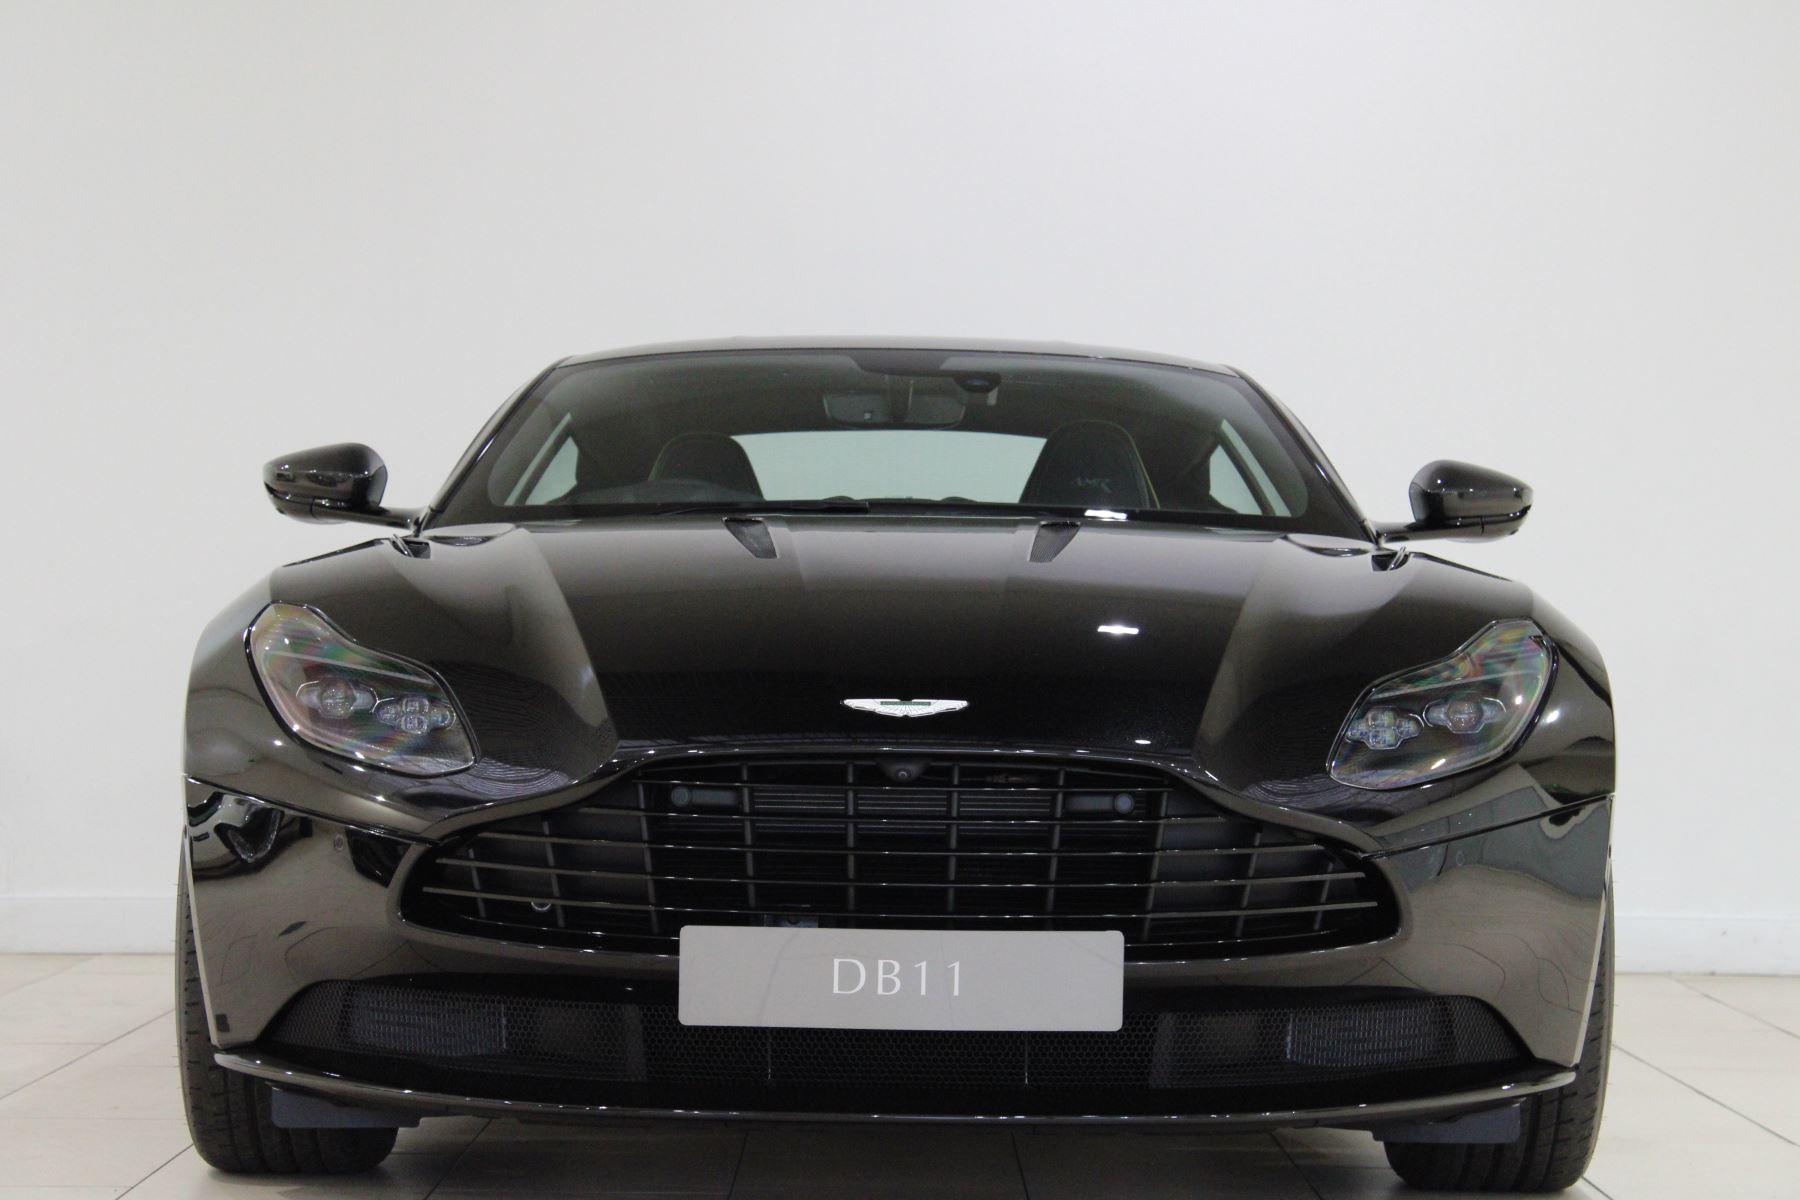 Aston Martin DB11 AMR Touchtronic image 4